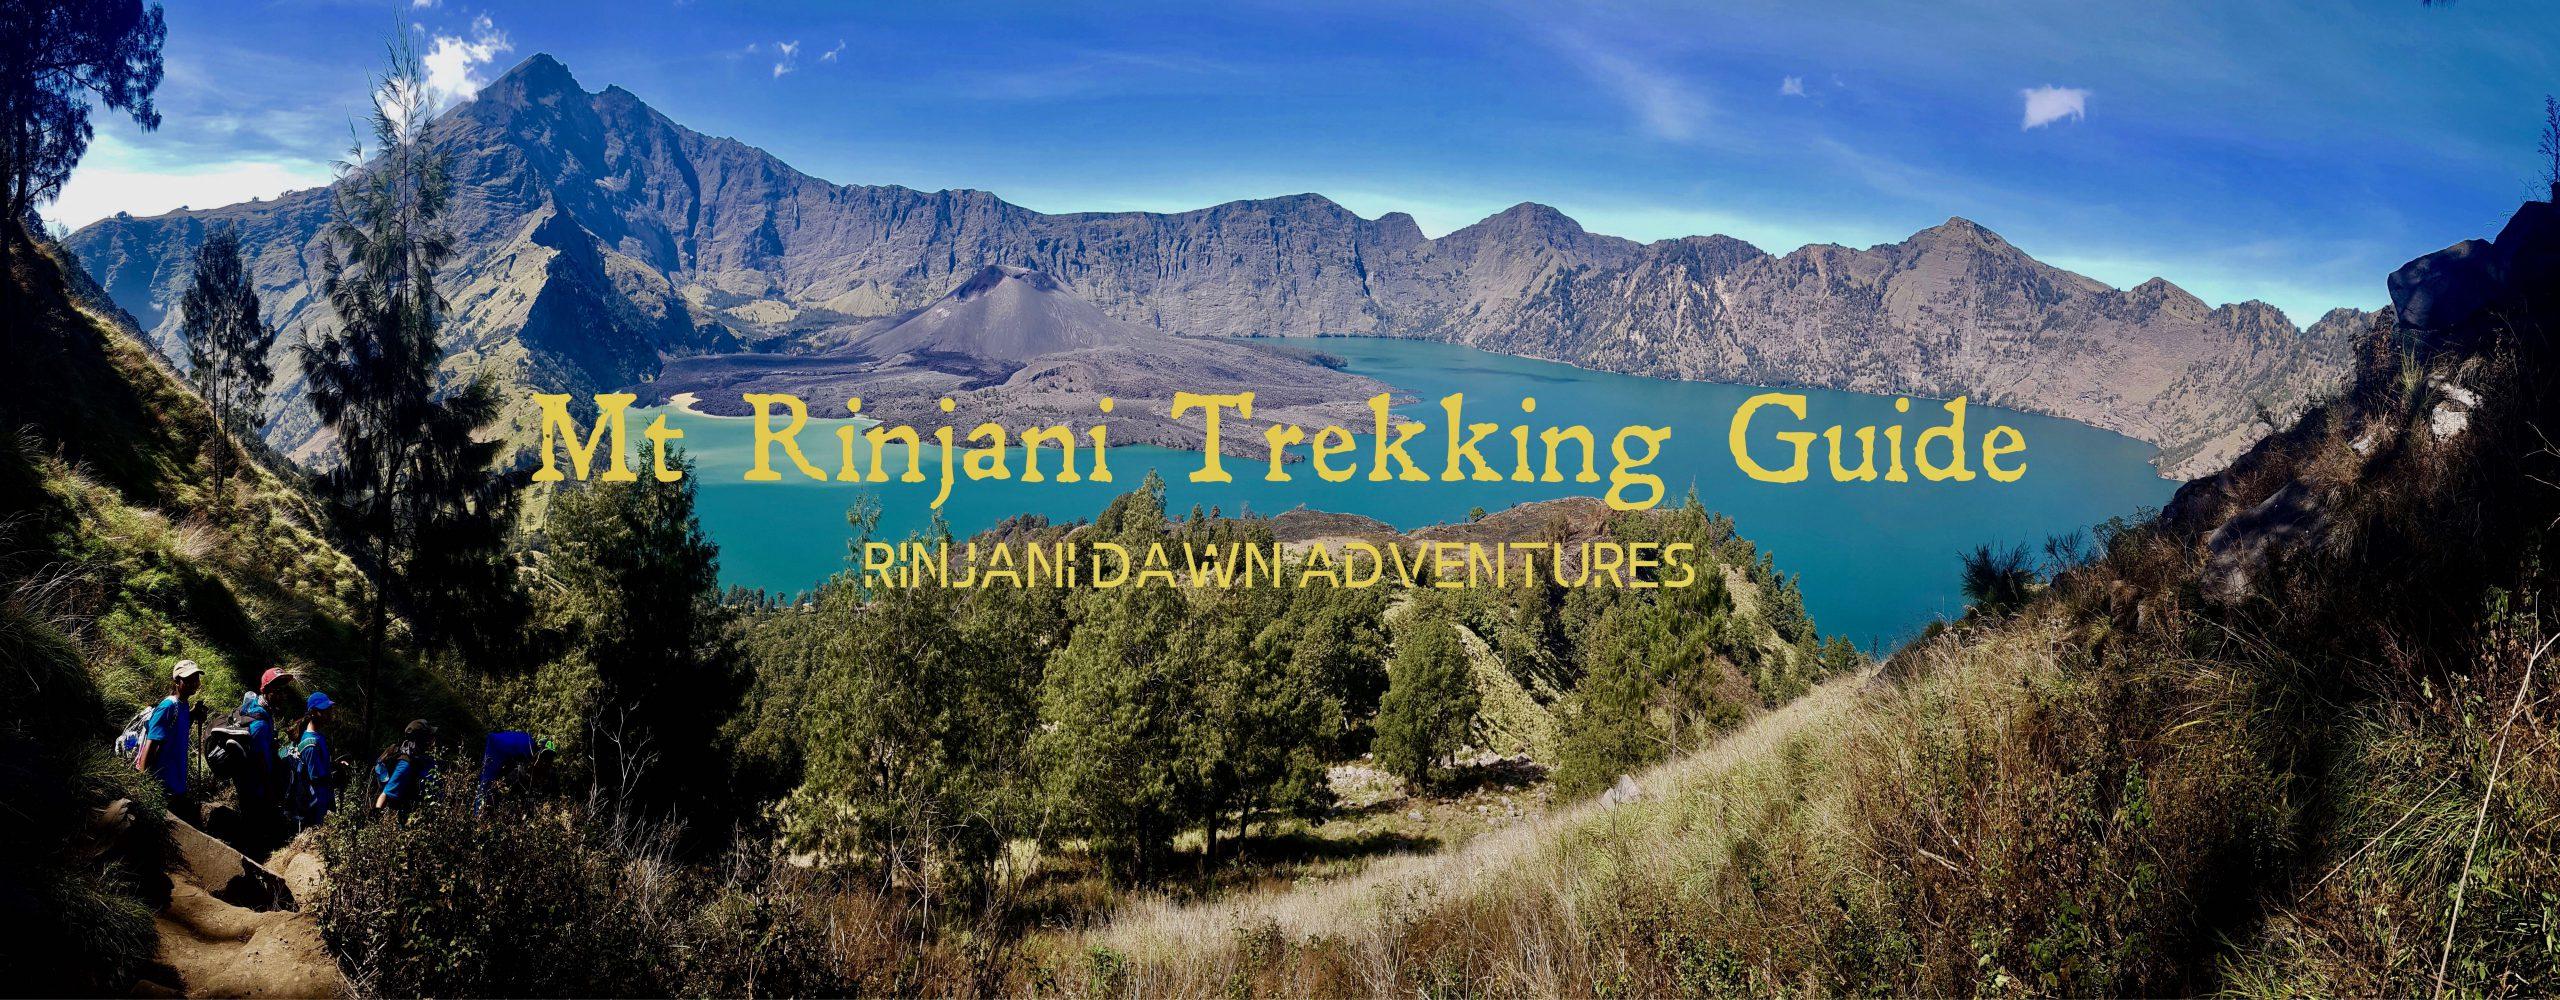 Mount Rinjani Trekking Guide 2020.